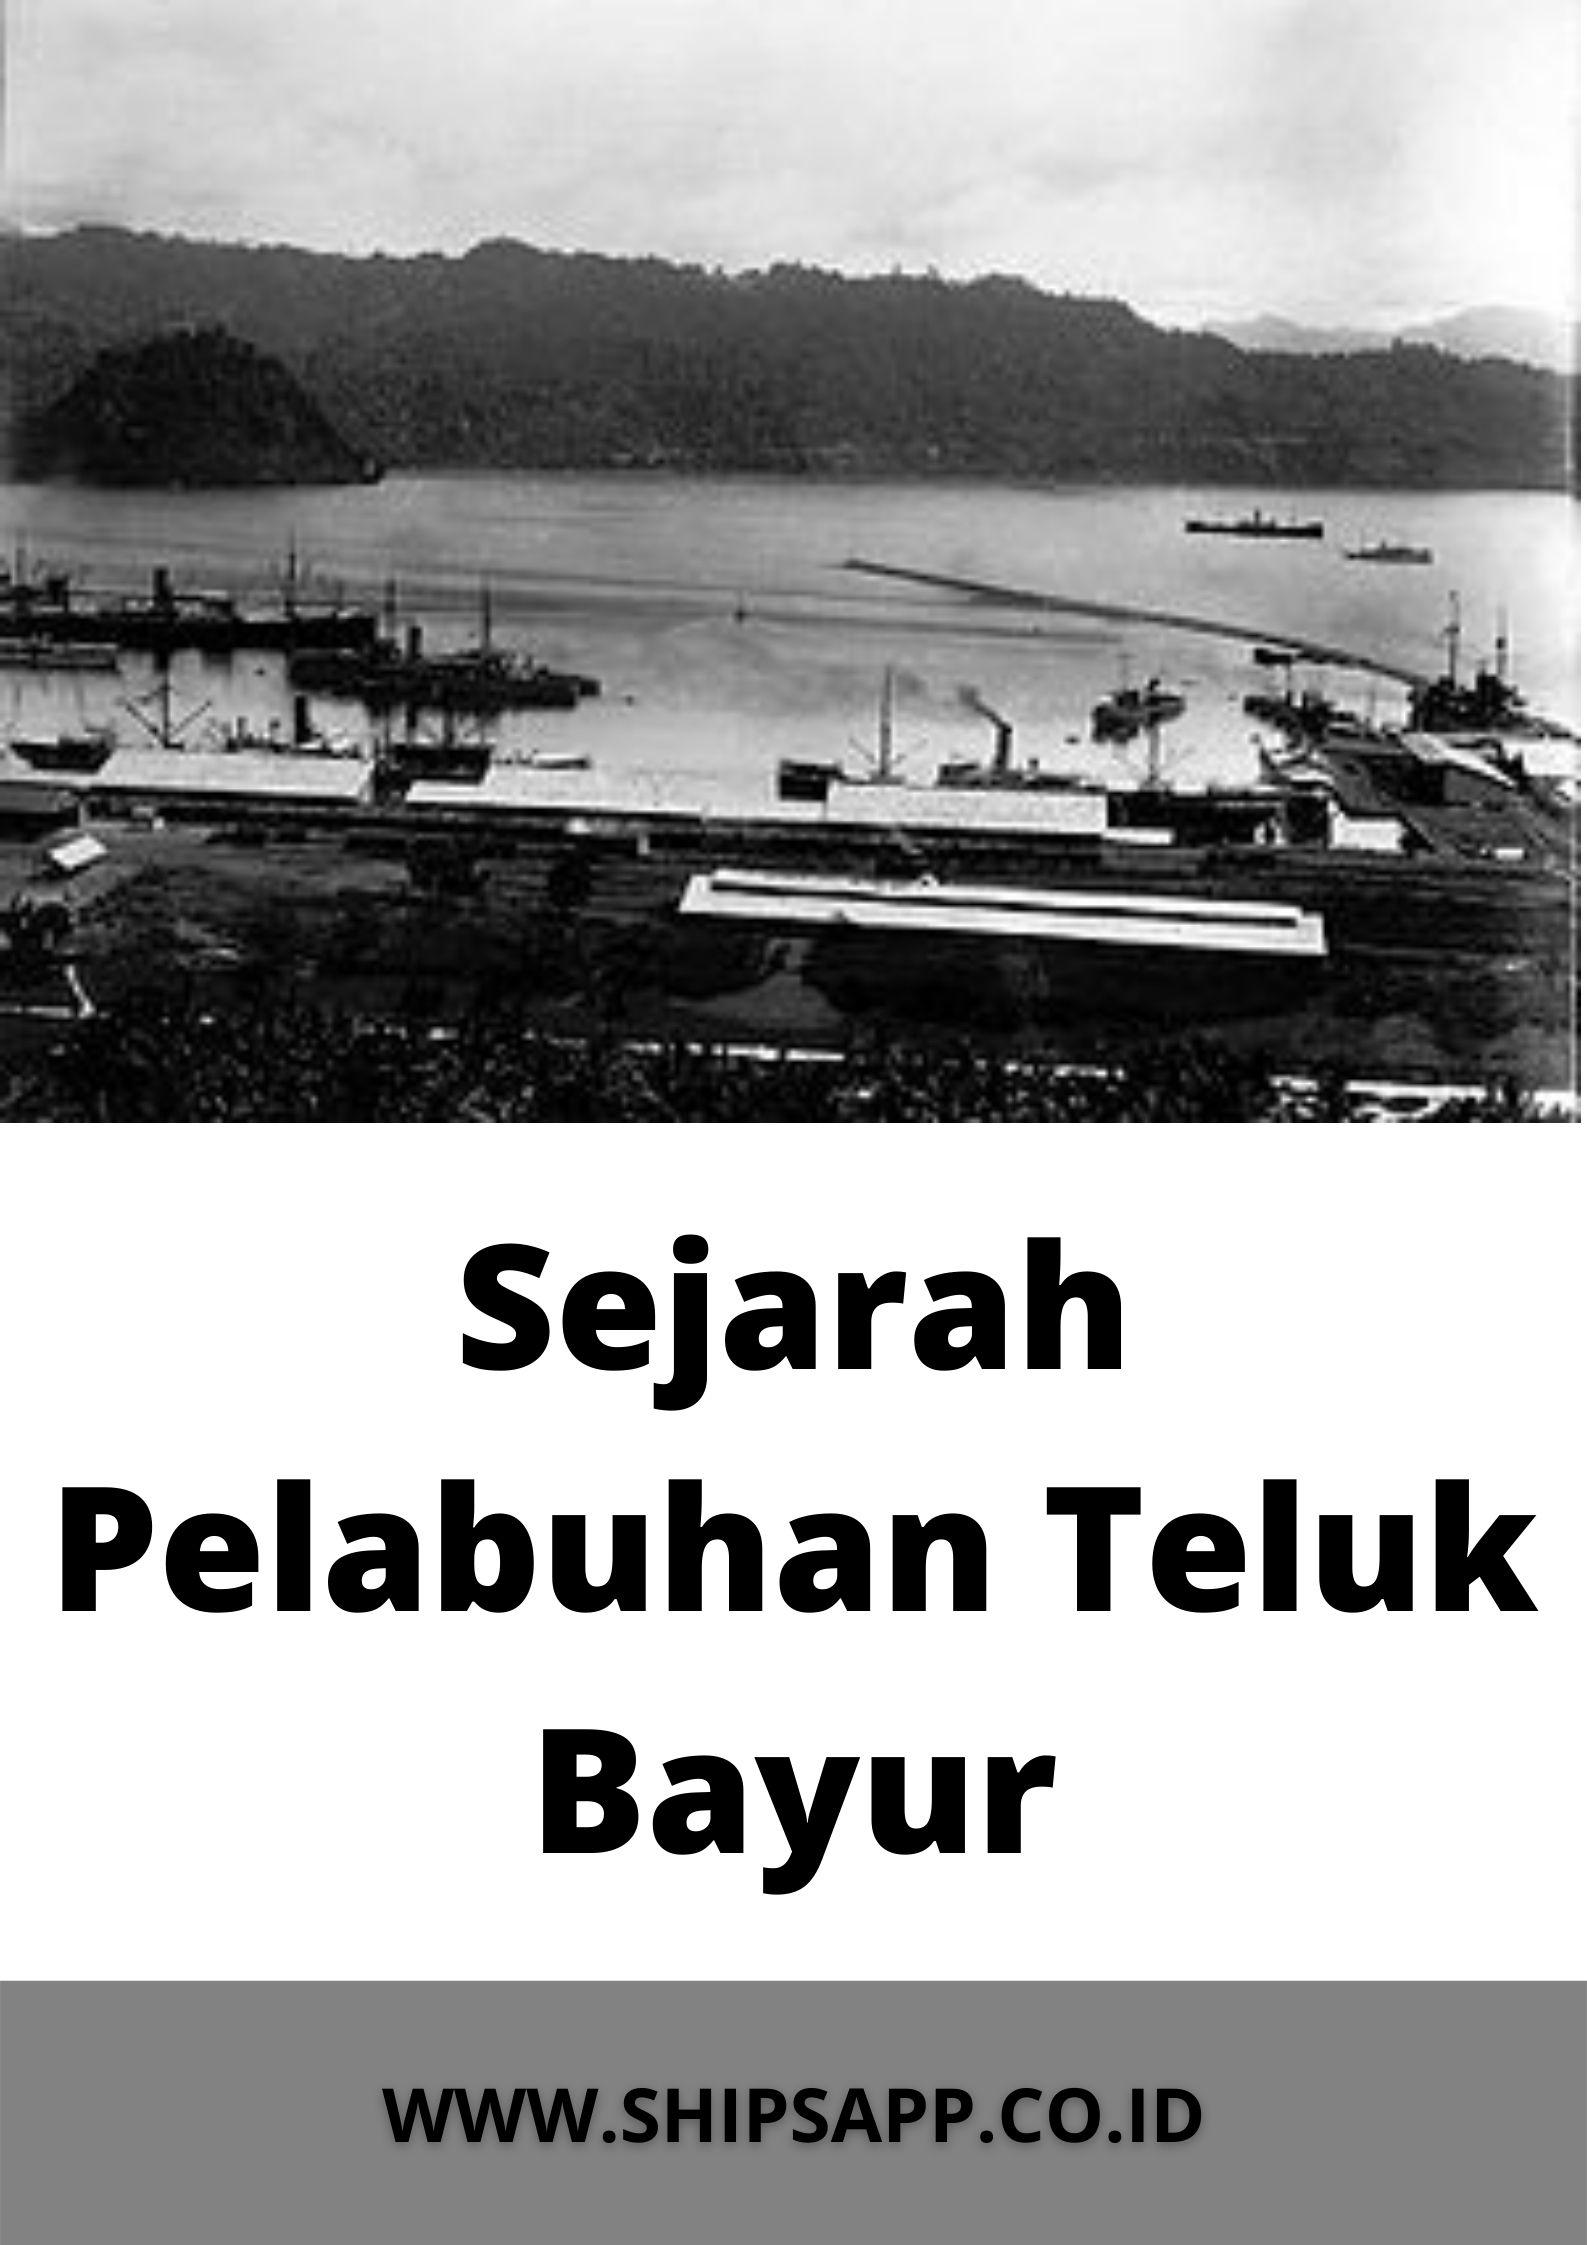 Sejarah Pelabuhan Teluk Bayur